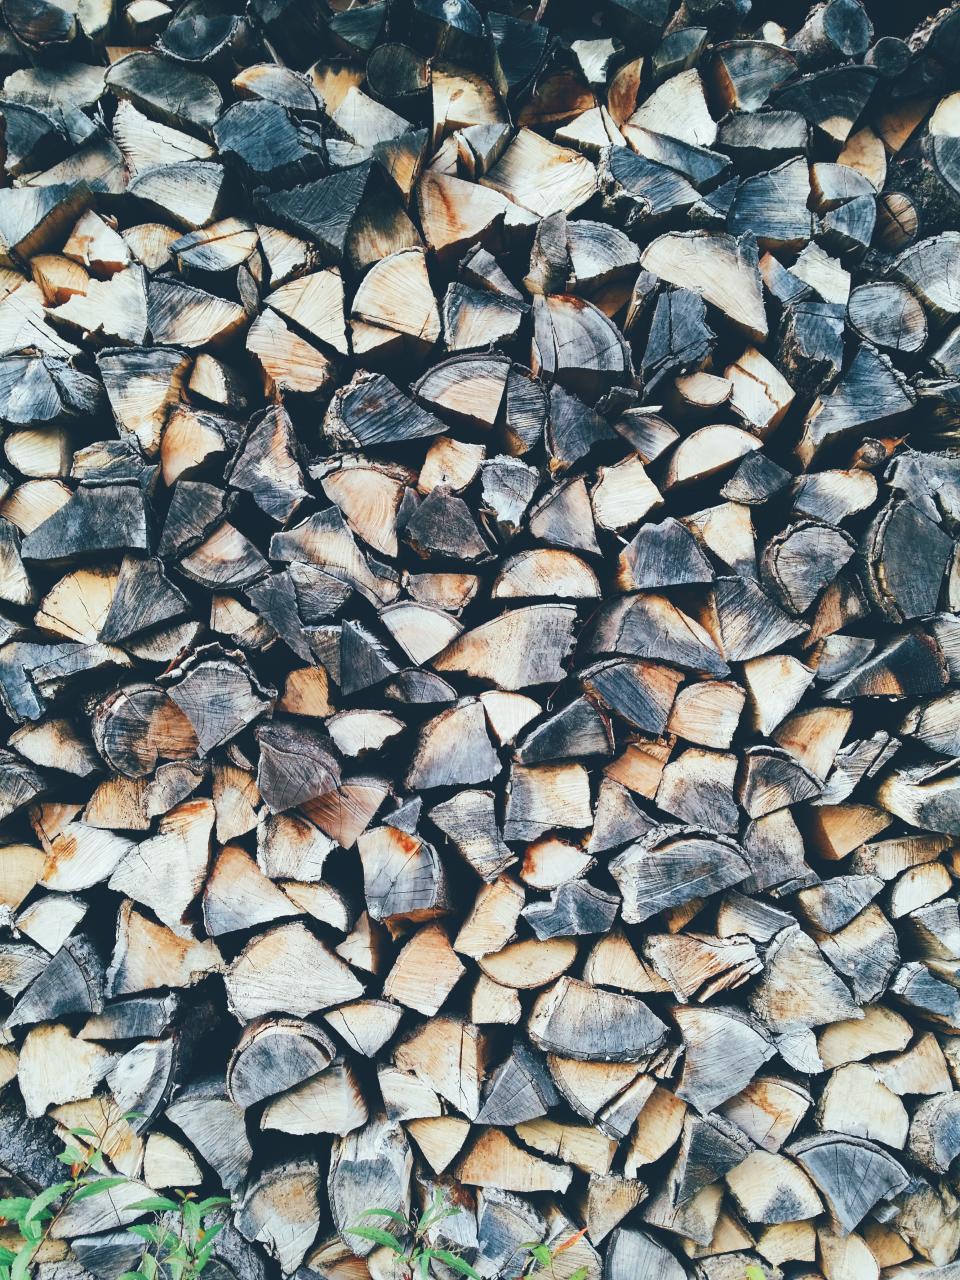 wood, logs, lumber, nature, texture